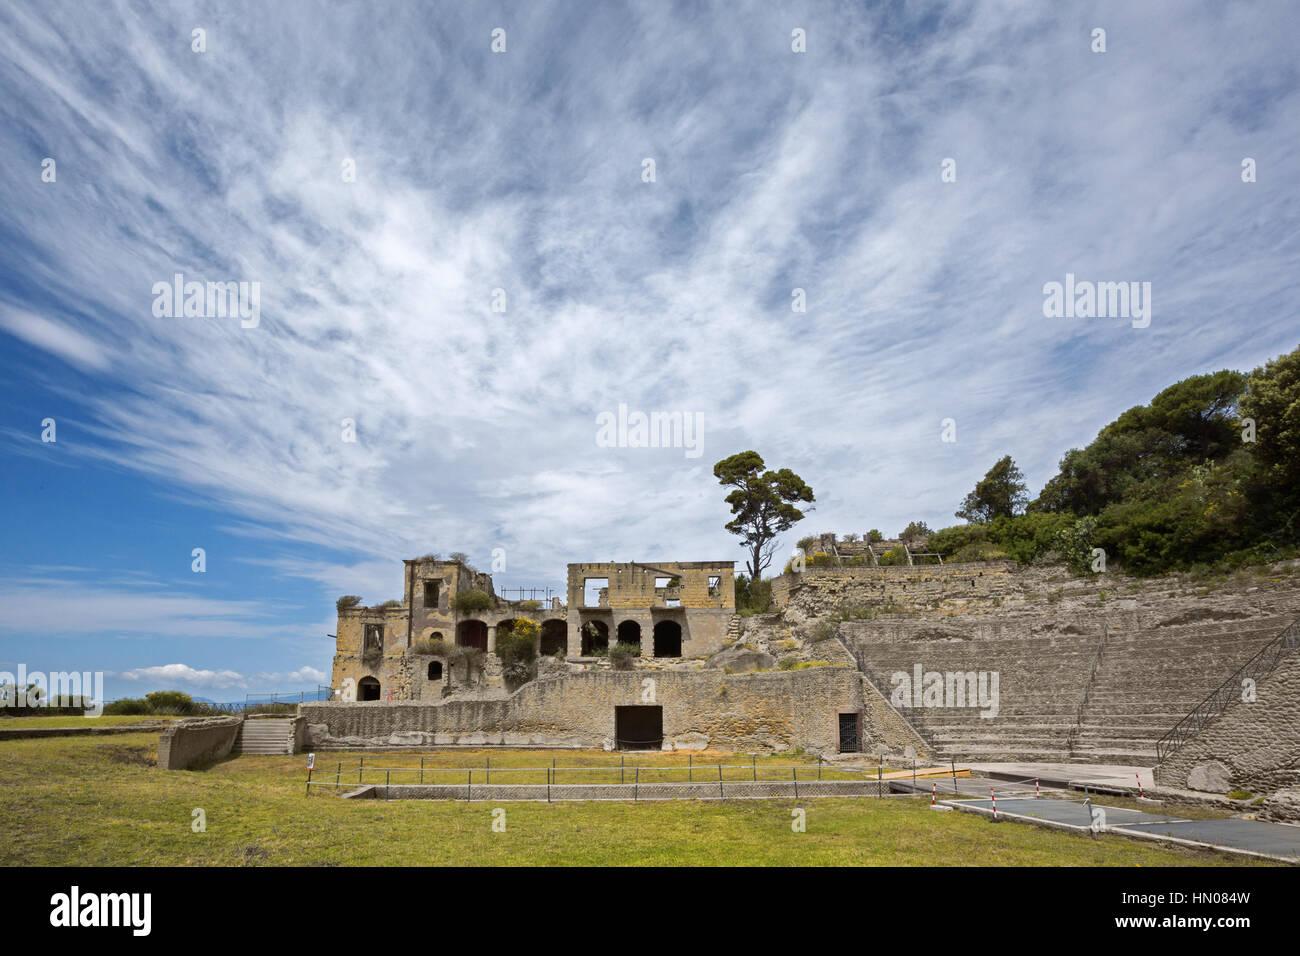 Naples (Italy) - Pausilypon archaelogical site. Ruins of Publius Vedius Pollio Villa on the promontory of Posillipo - Stock Image